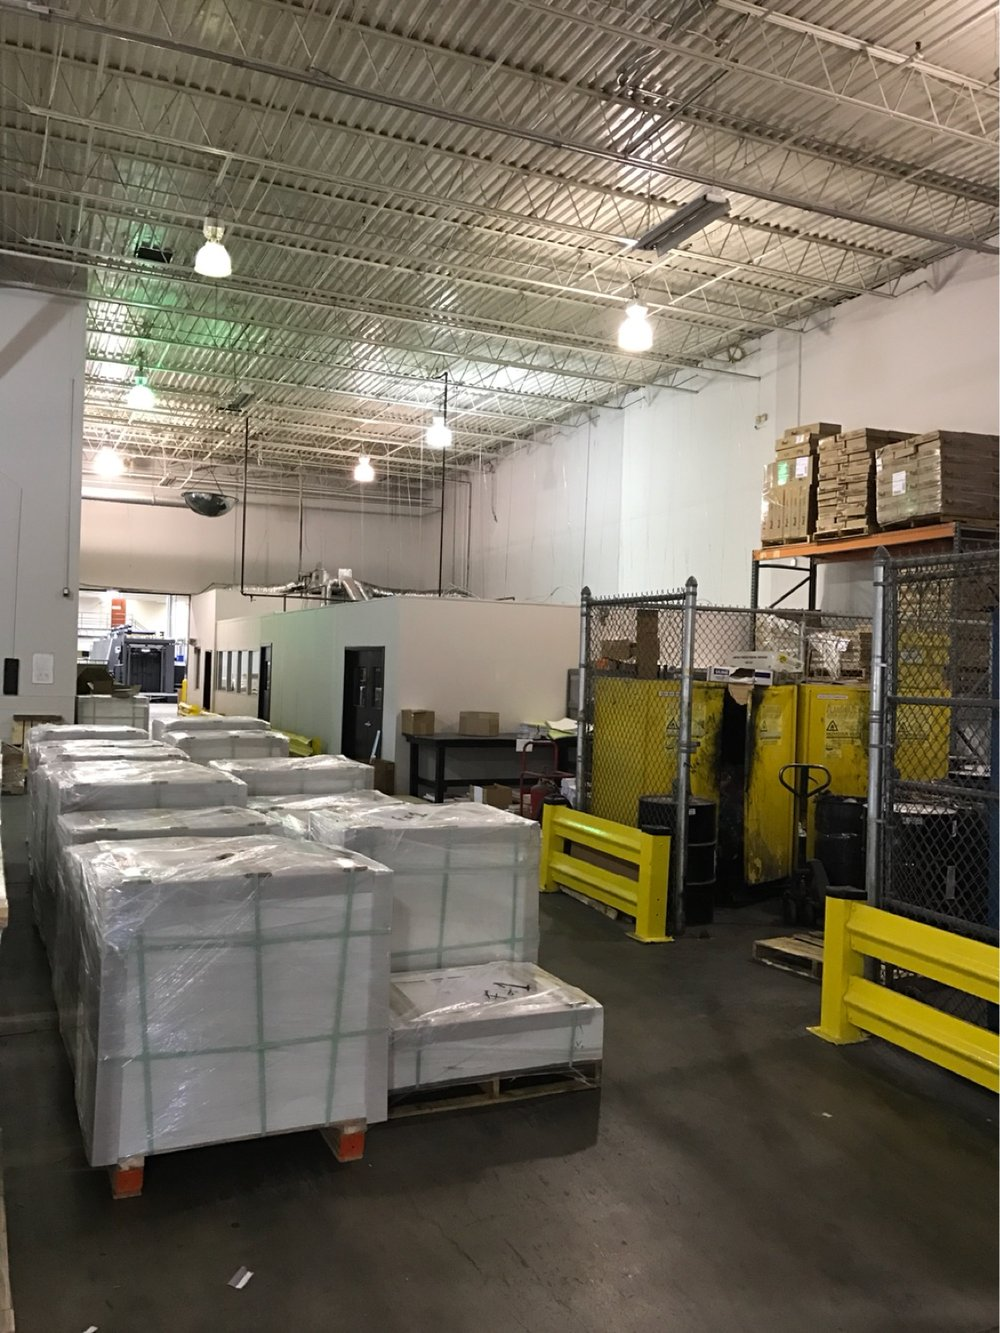 Unimac Graphics LED Lighting Retrofit - Albright Energy Solutions - Albright Electric - Mahwah NJ (8).jpeg